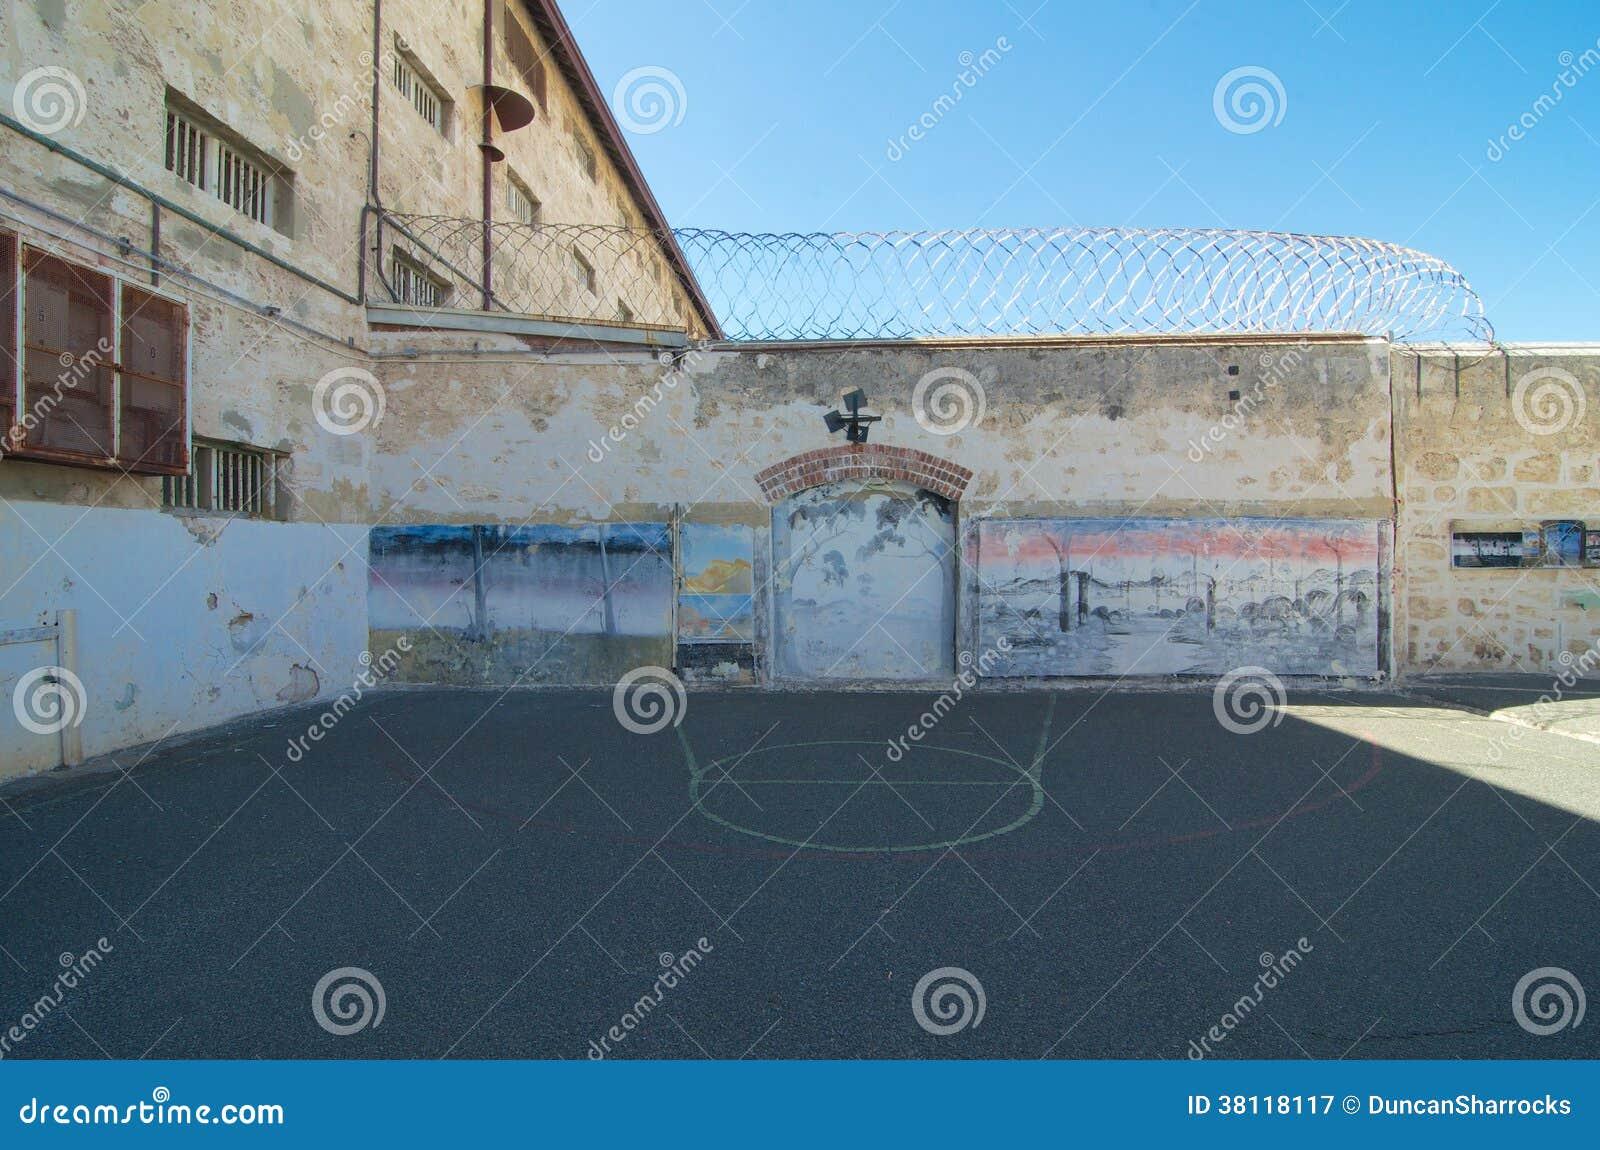 Indigenous prisoner art Fremantle Prison, Western Australia